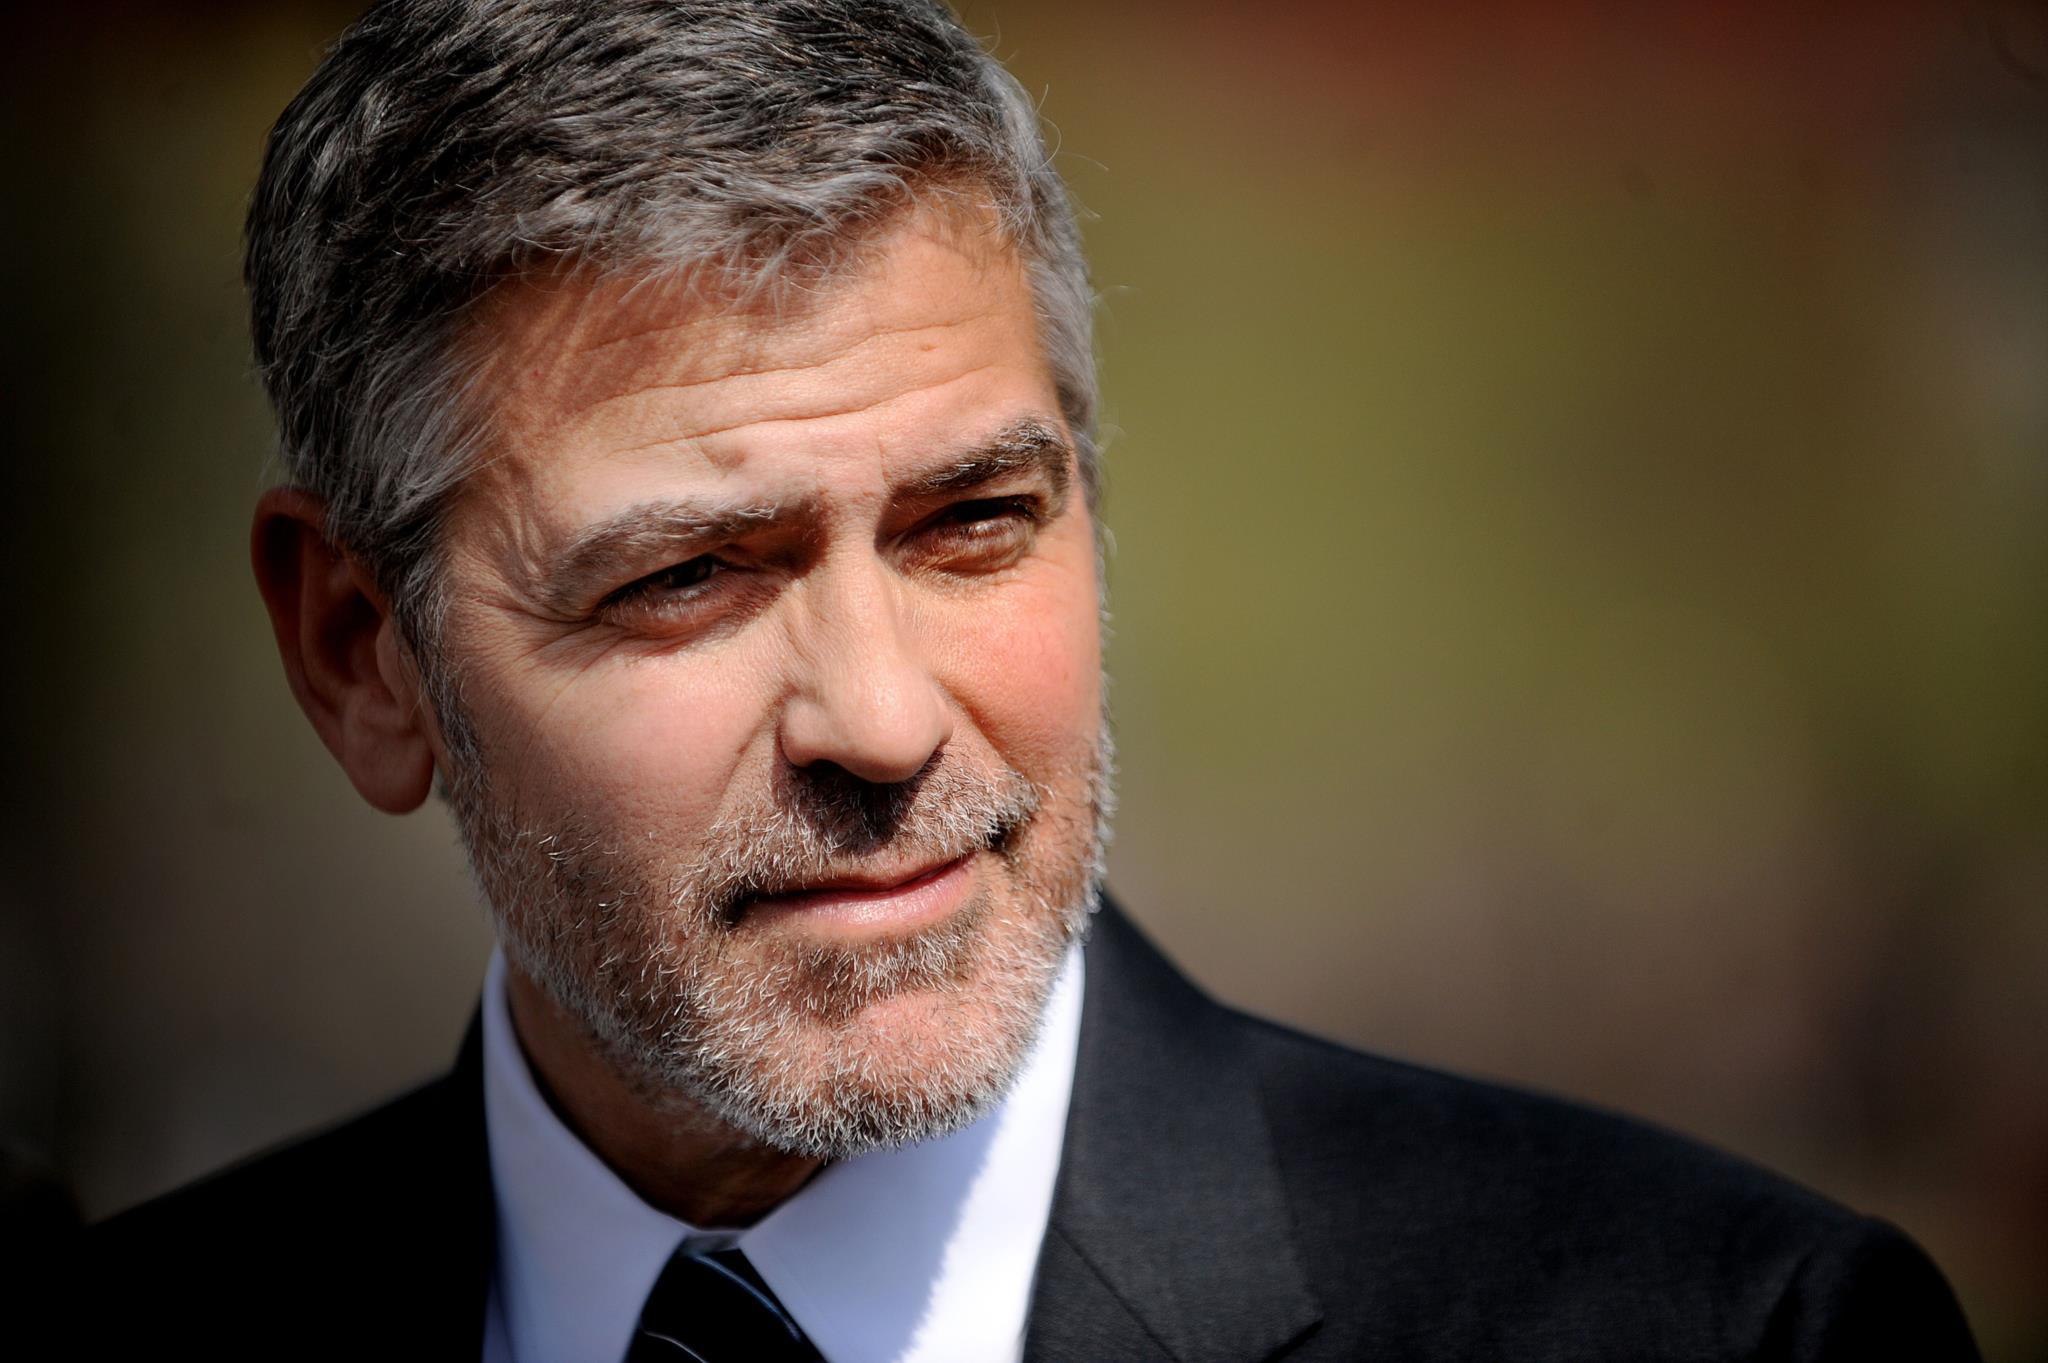 PÚBLICO - Mil milhões de dólares é quanto vale a tequila de George Clooney